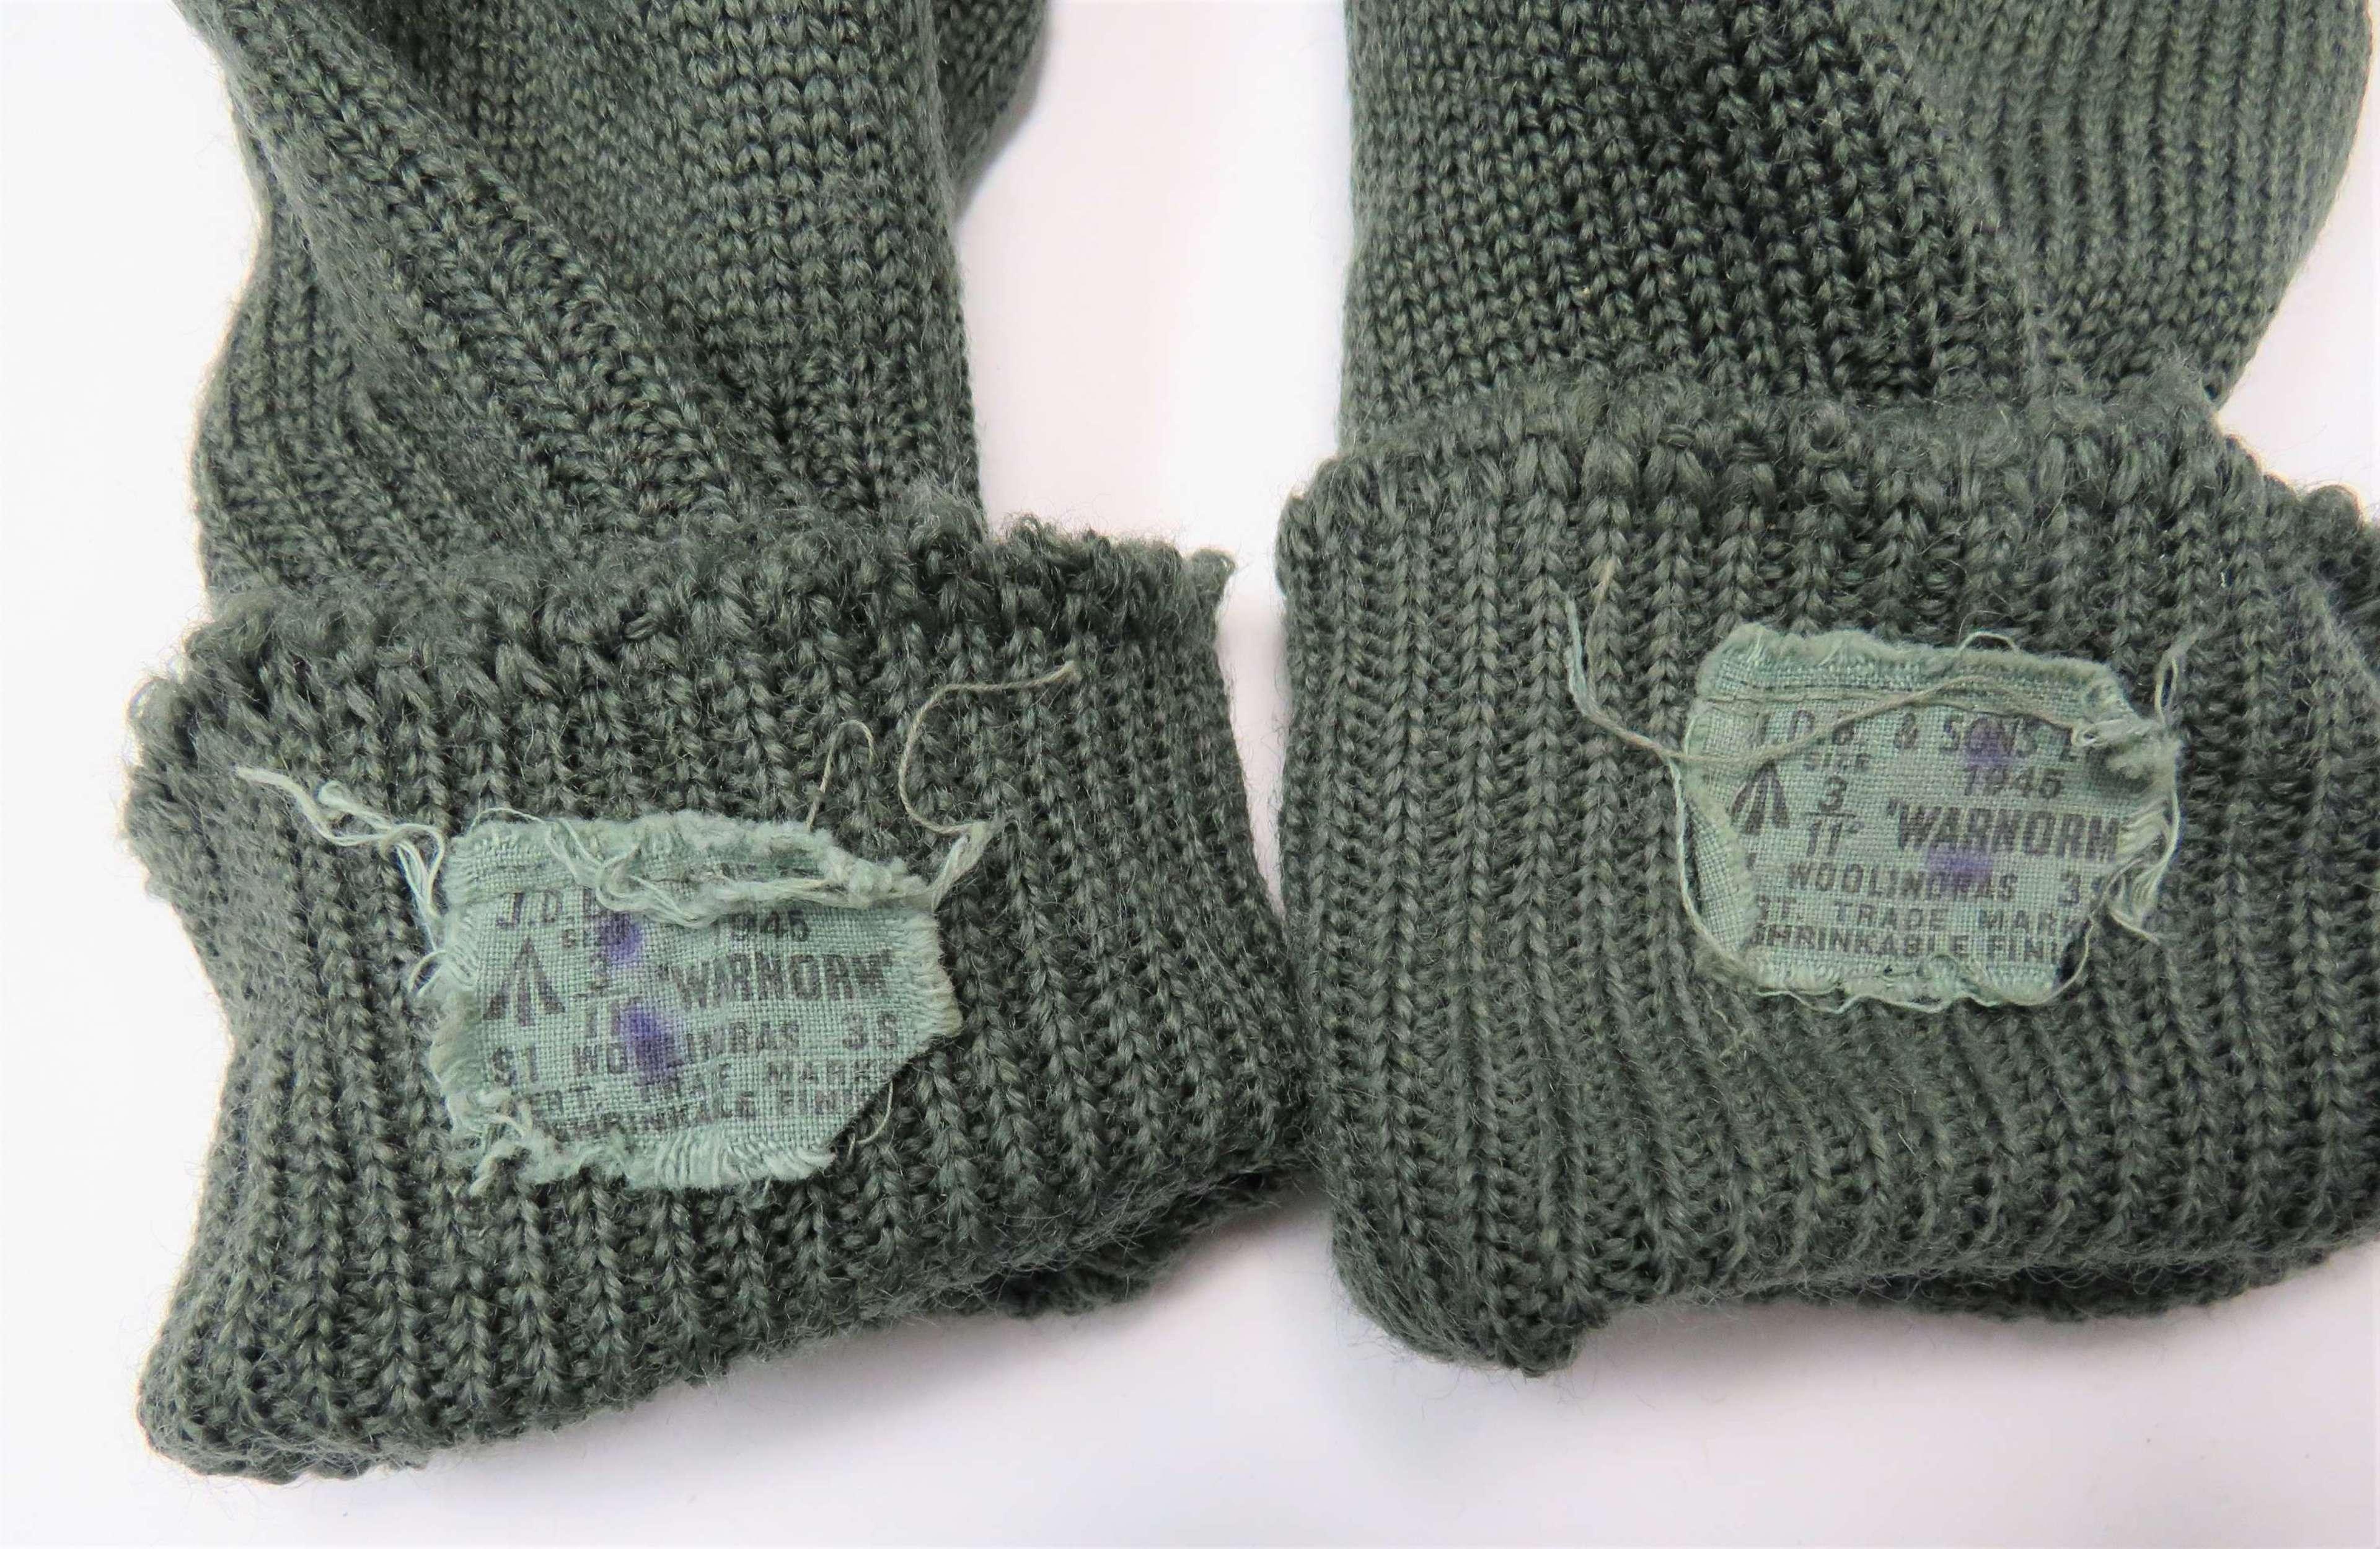 Rare 1945 Dated British Army Jungle Socks